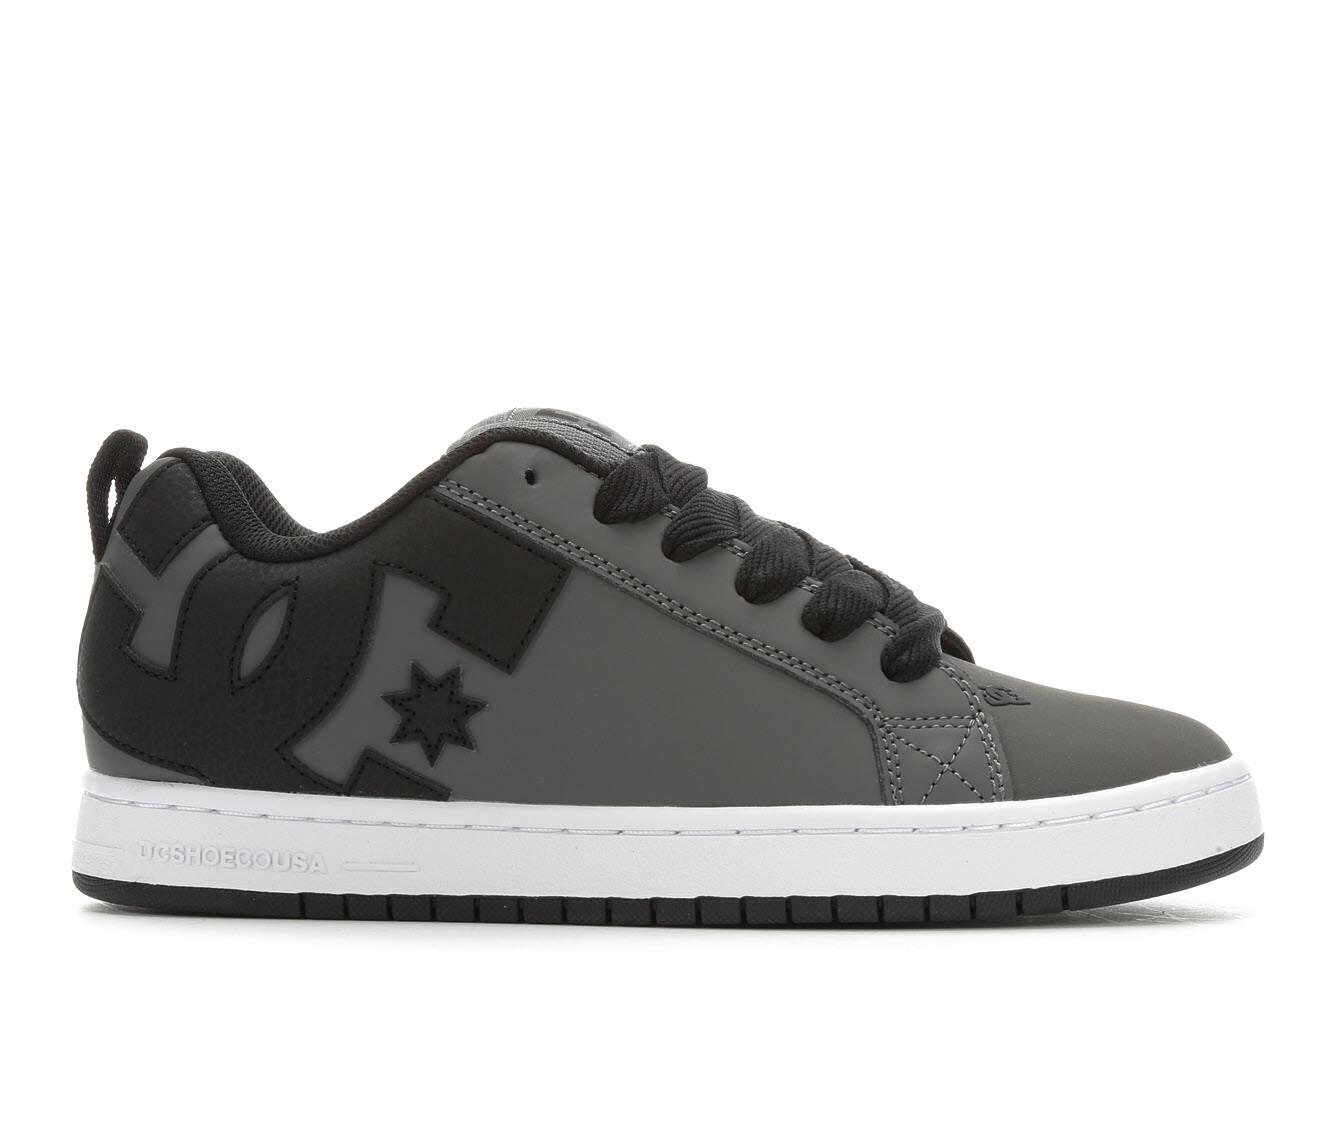 Men's DC Court Graffik Skate Shoes Grey/Grey/Black